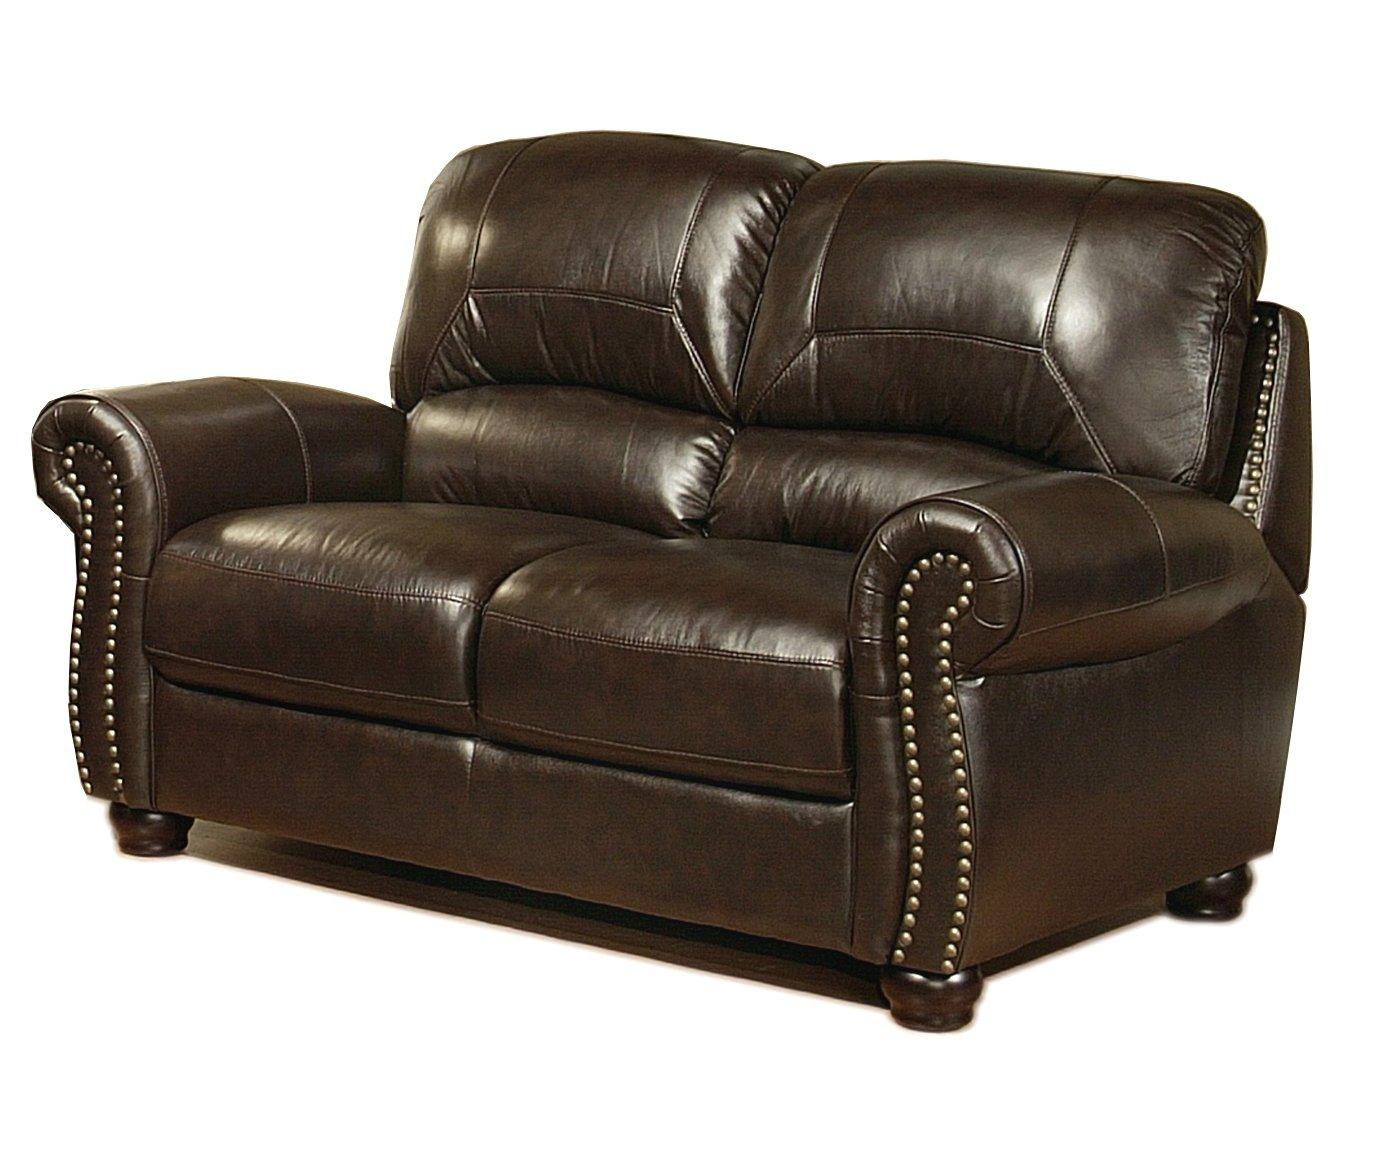 Abbyson Living Broadway Italian Leather Sofa